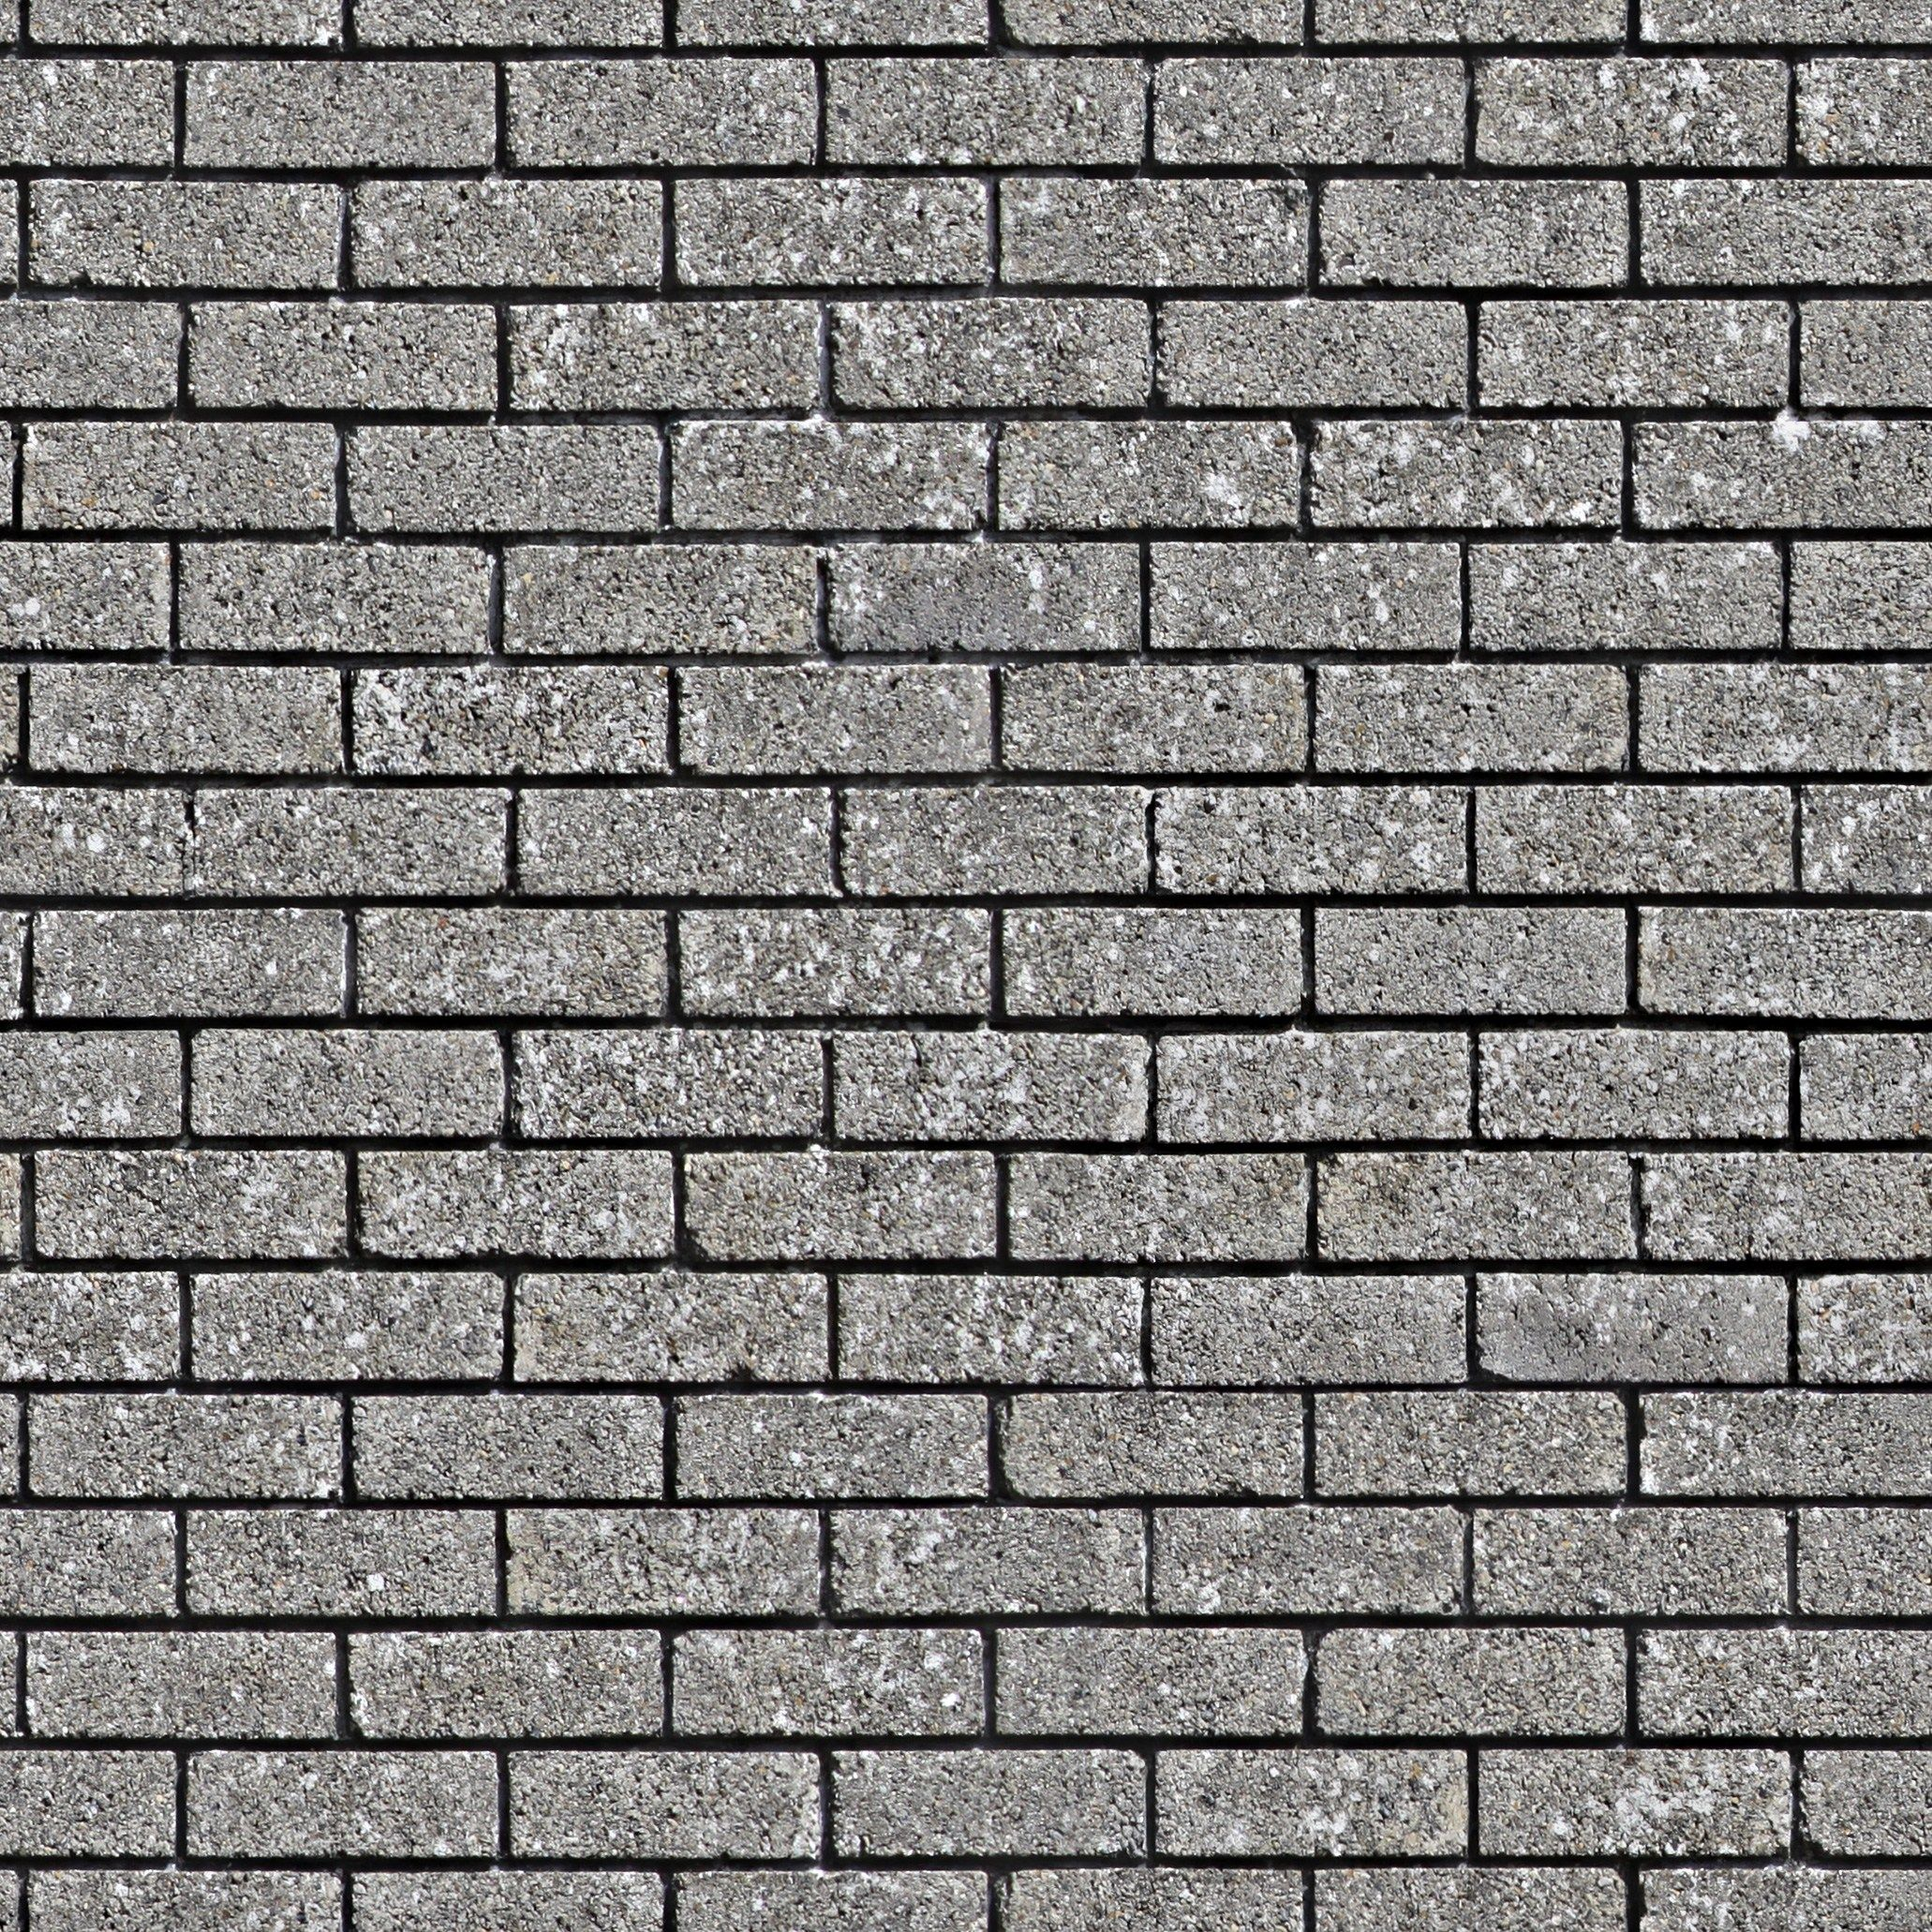 Free Old Concrete Brick Wall Seamless Texture Concrete Bricks Seamless Textures Brick Wall